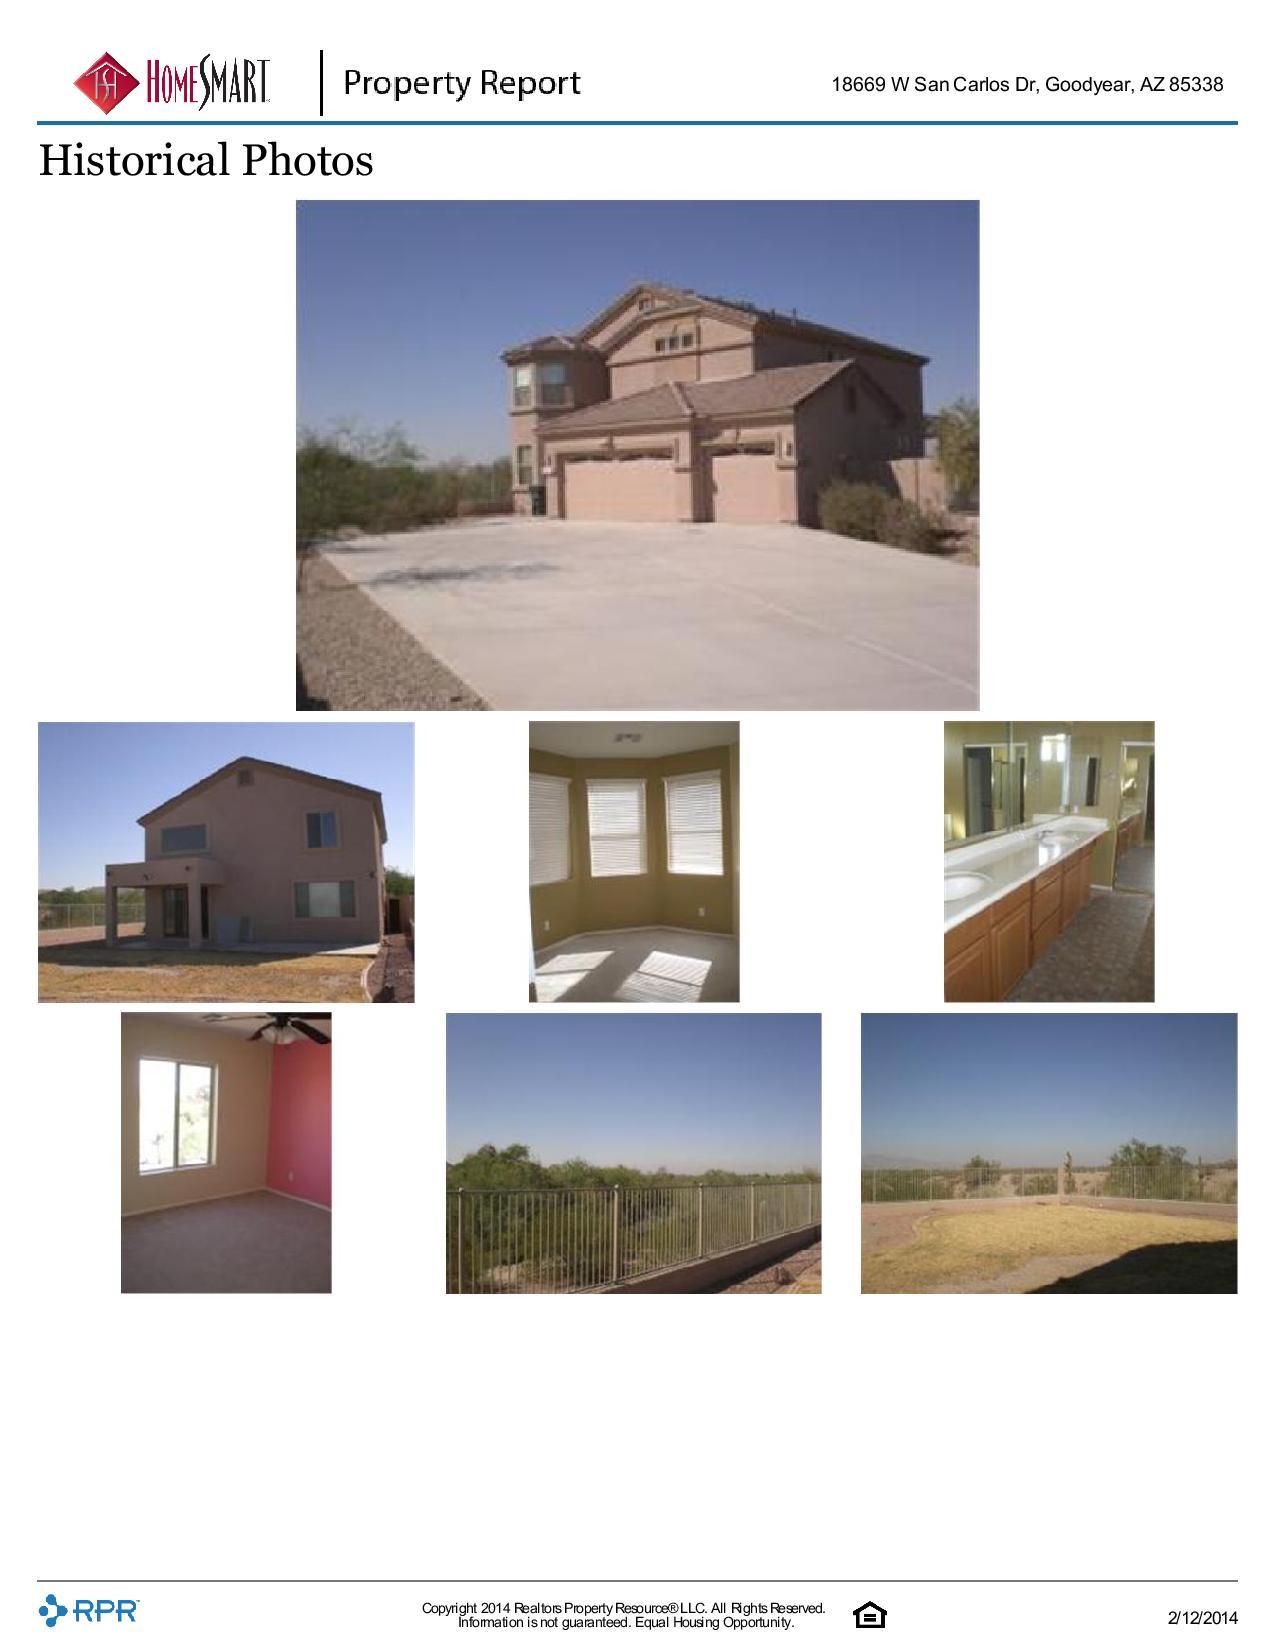 18669-W-San-Carlos-Dr-Goodyear-AZ-85338-page-005